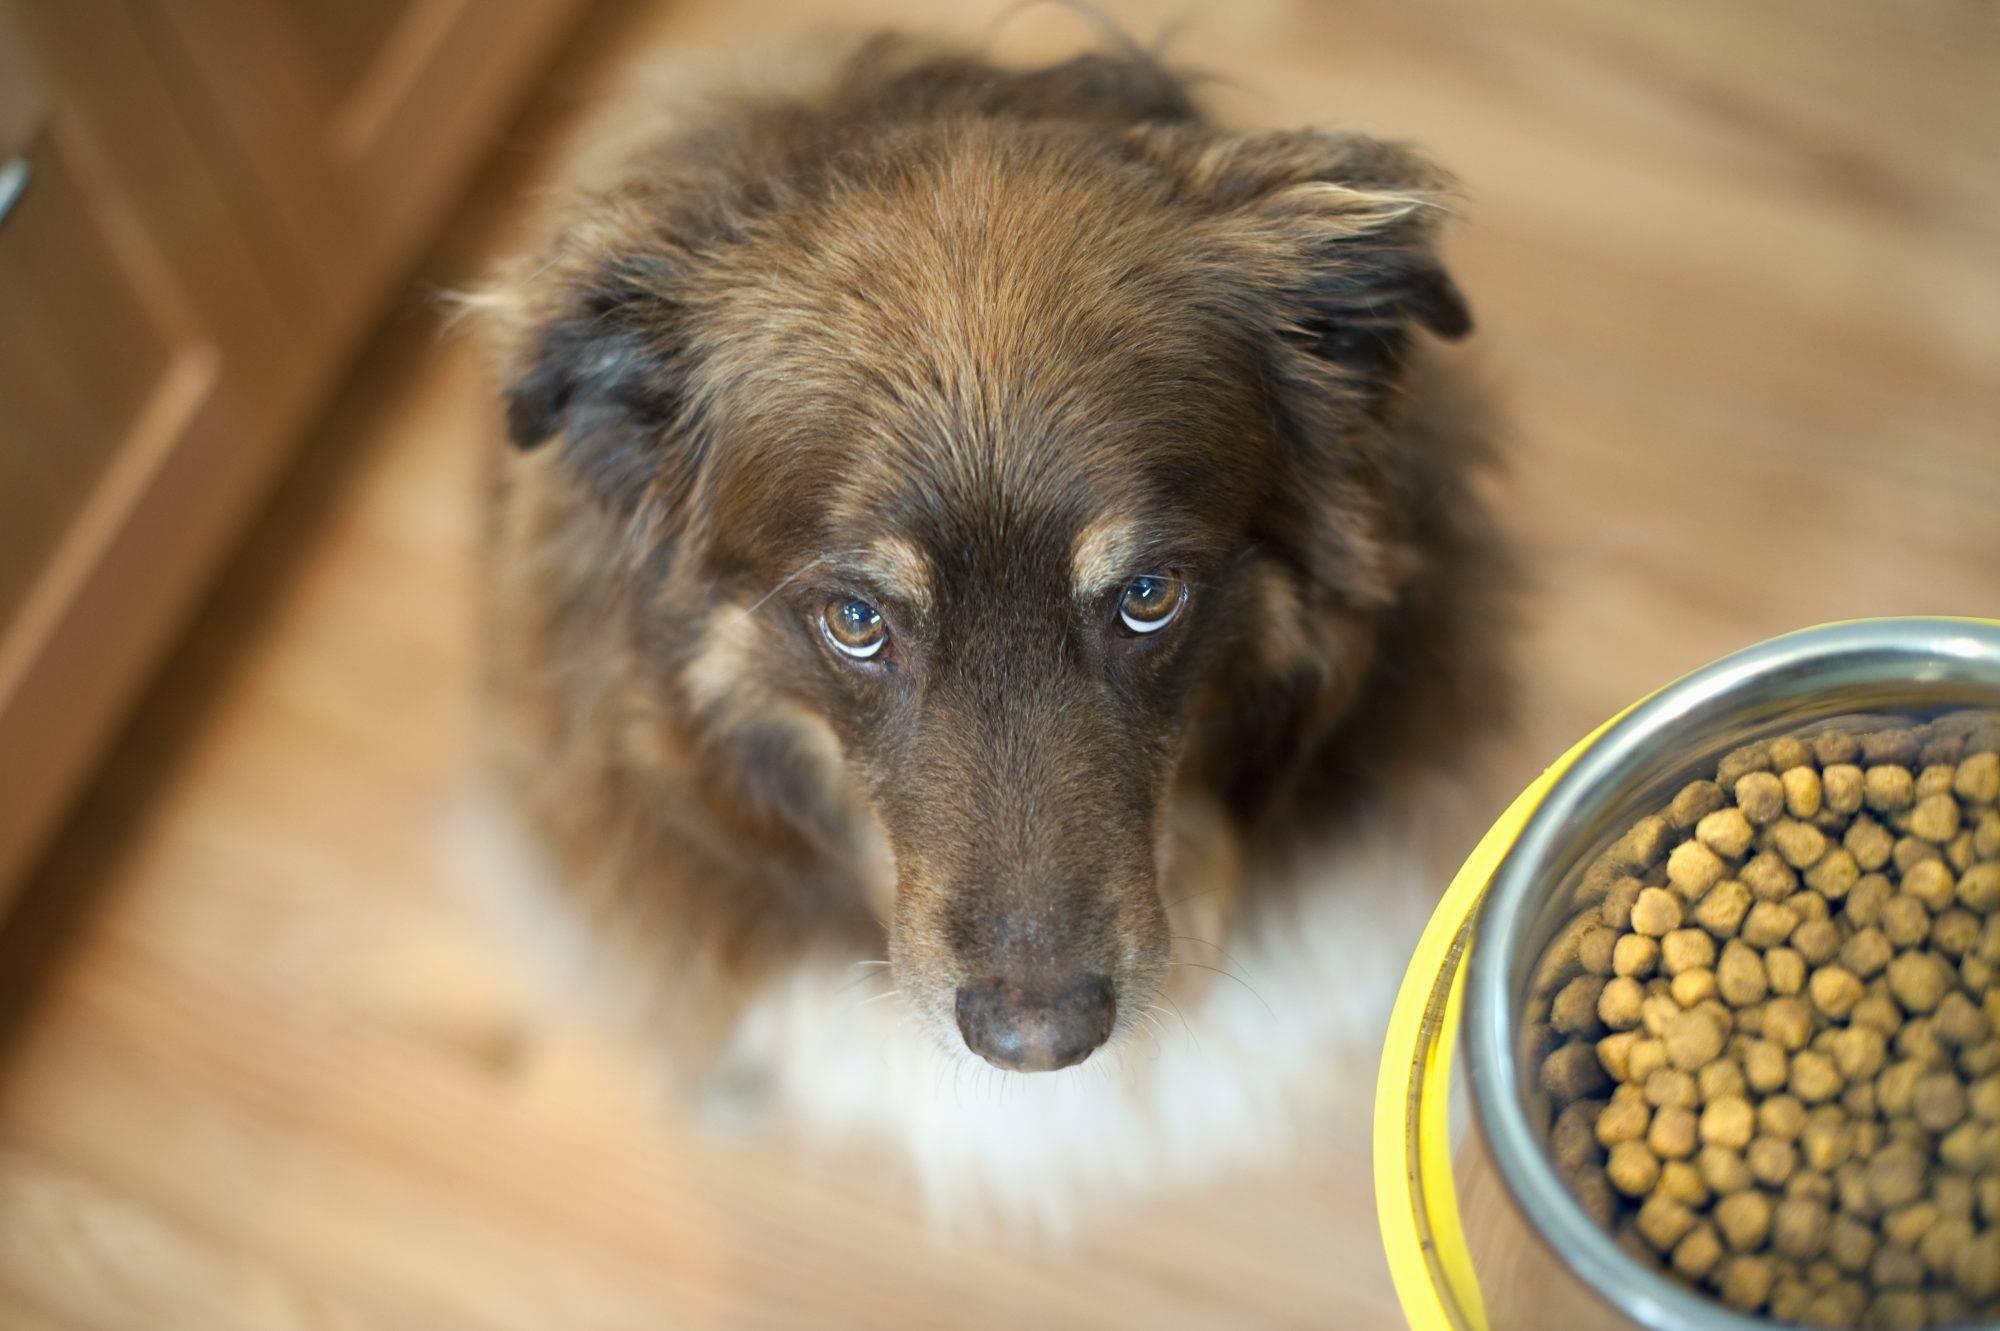 Можно ли есть собачий корм людям?